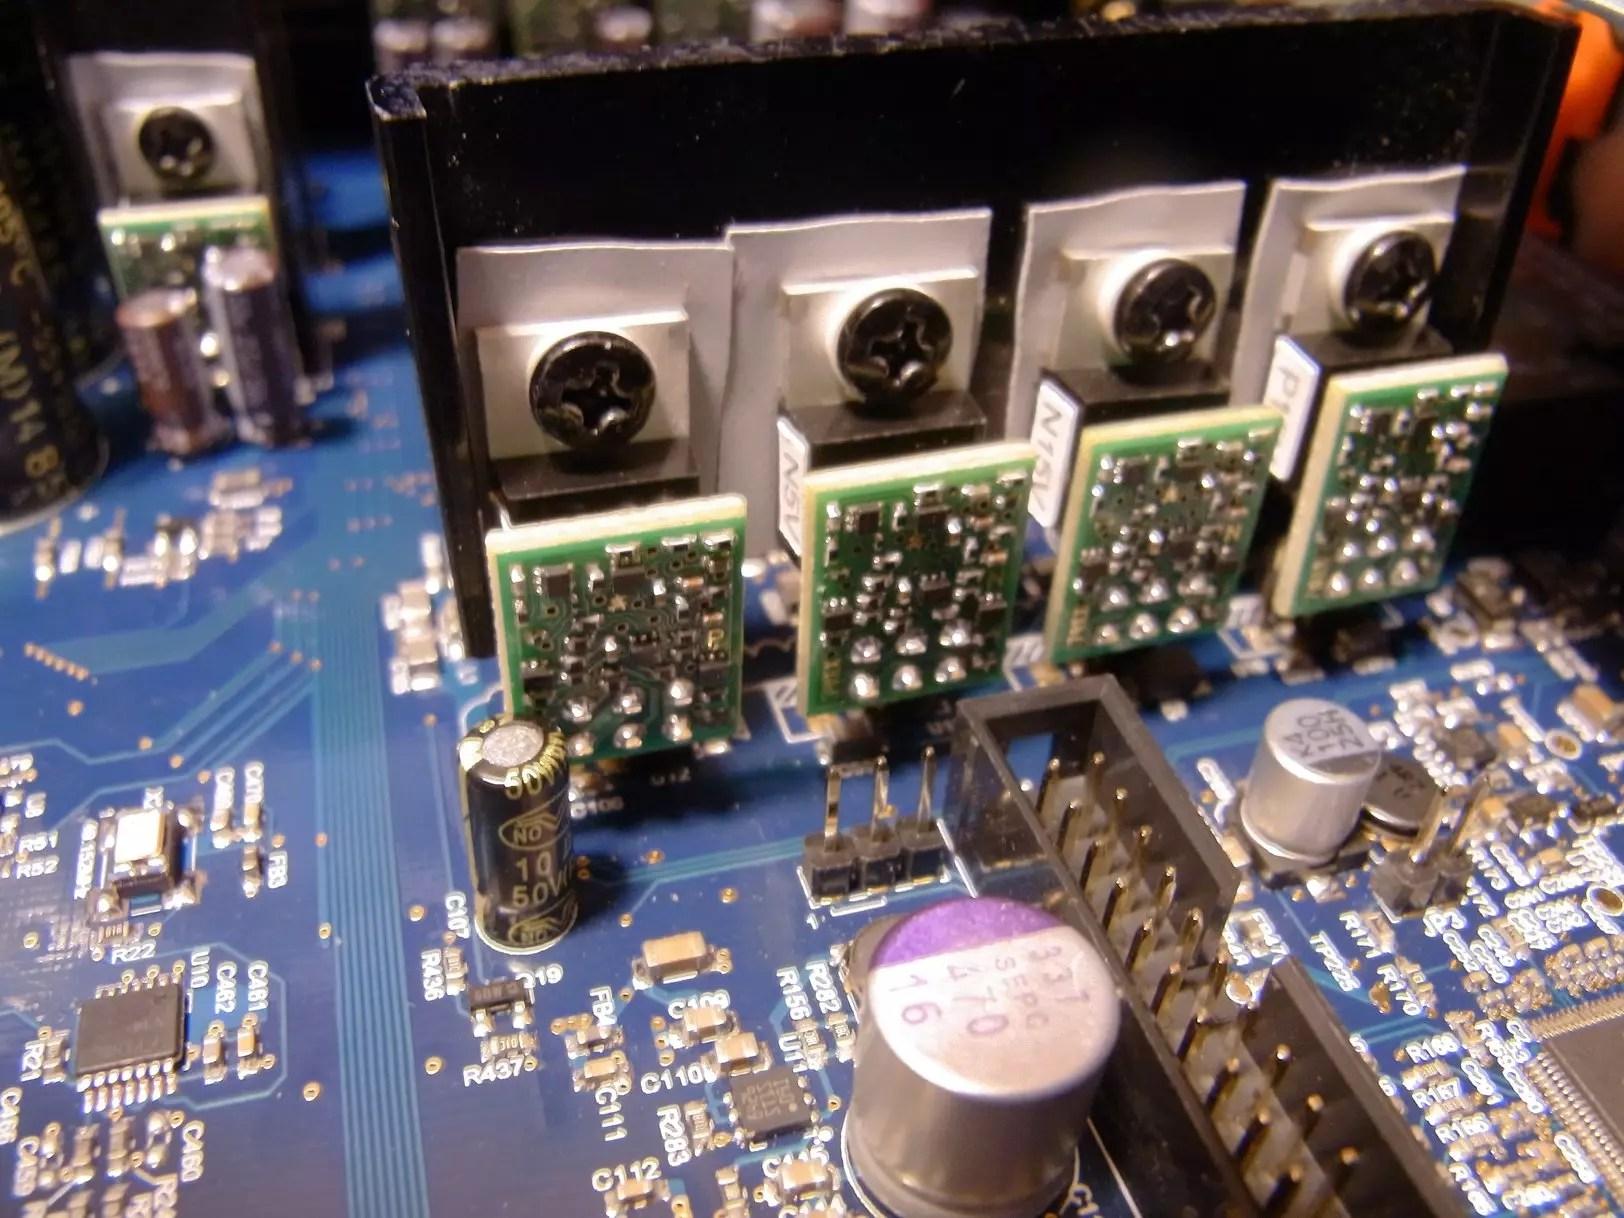 Discrete Voltage Regulators Sparkos Labs Inc